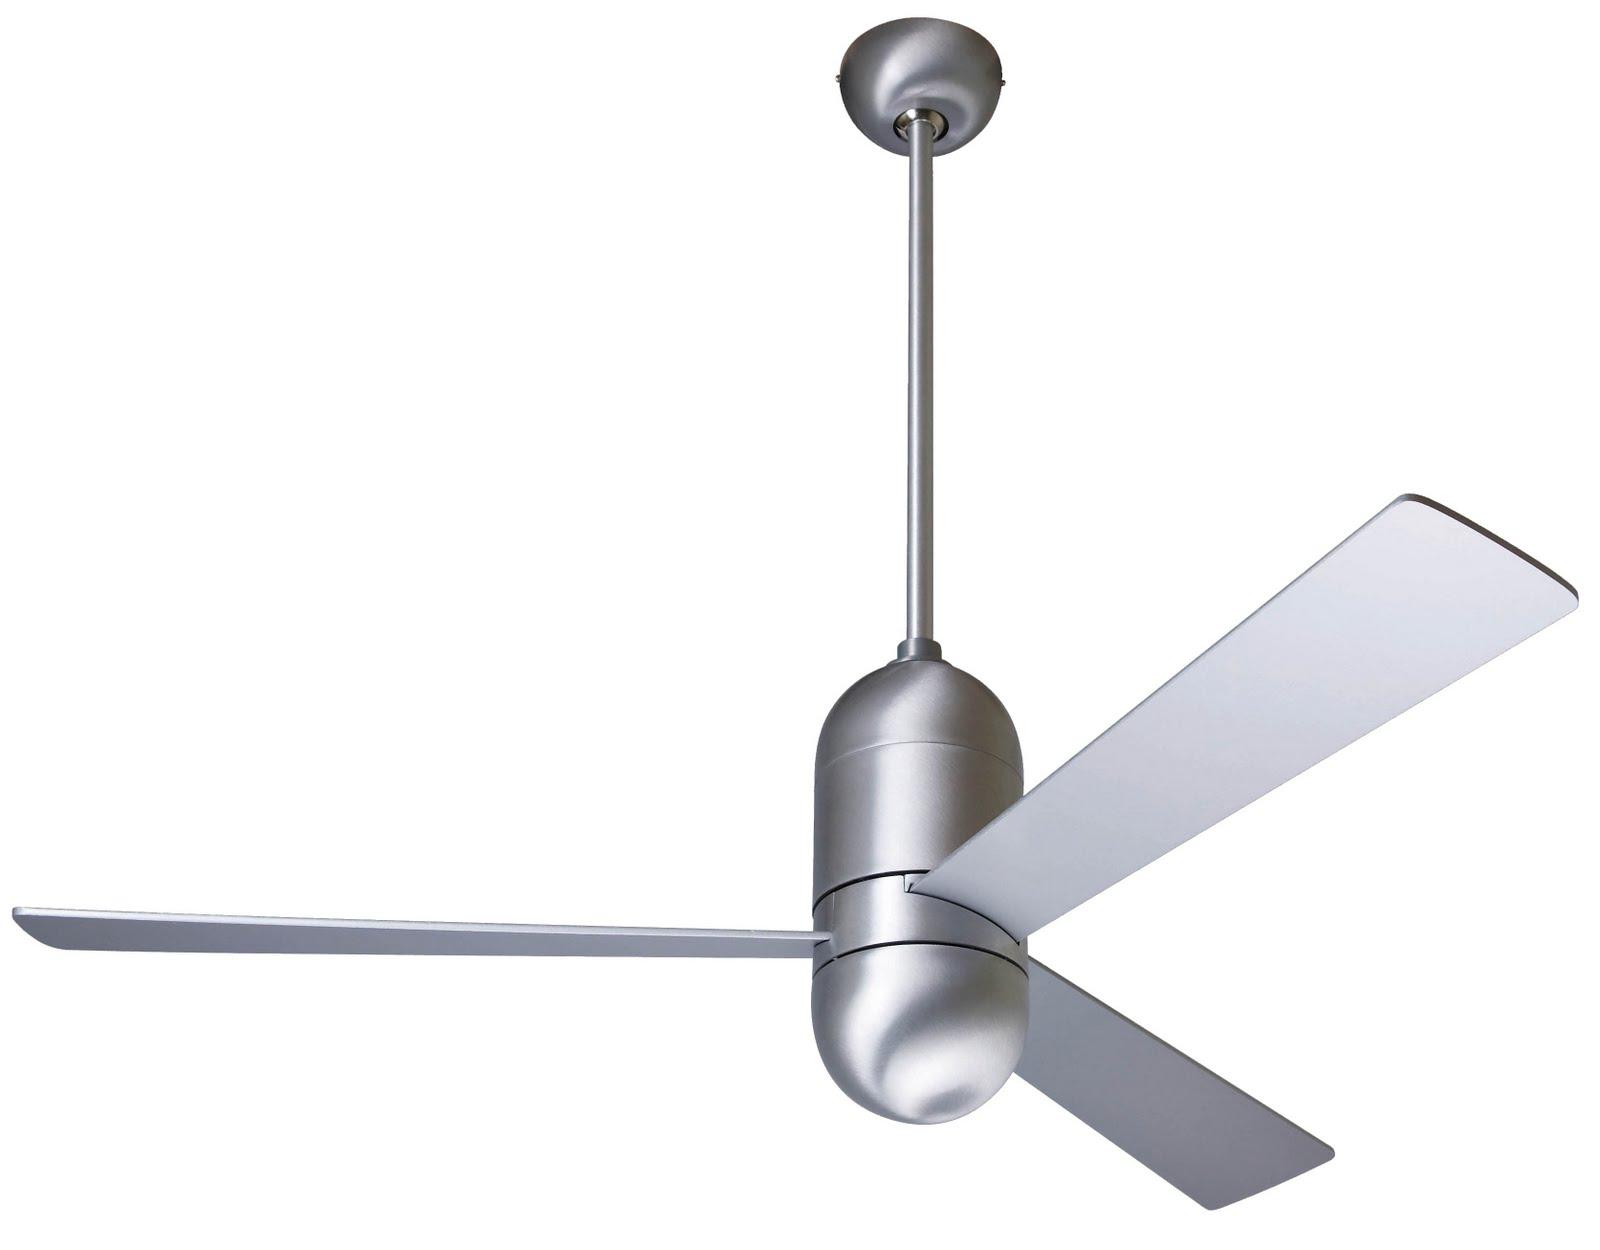 Modern Ceiling Fan Cirrus By Co